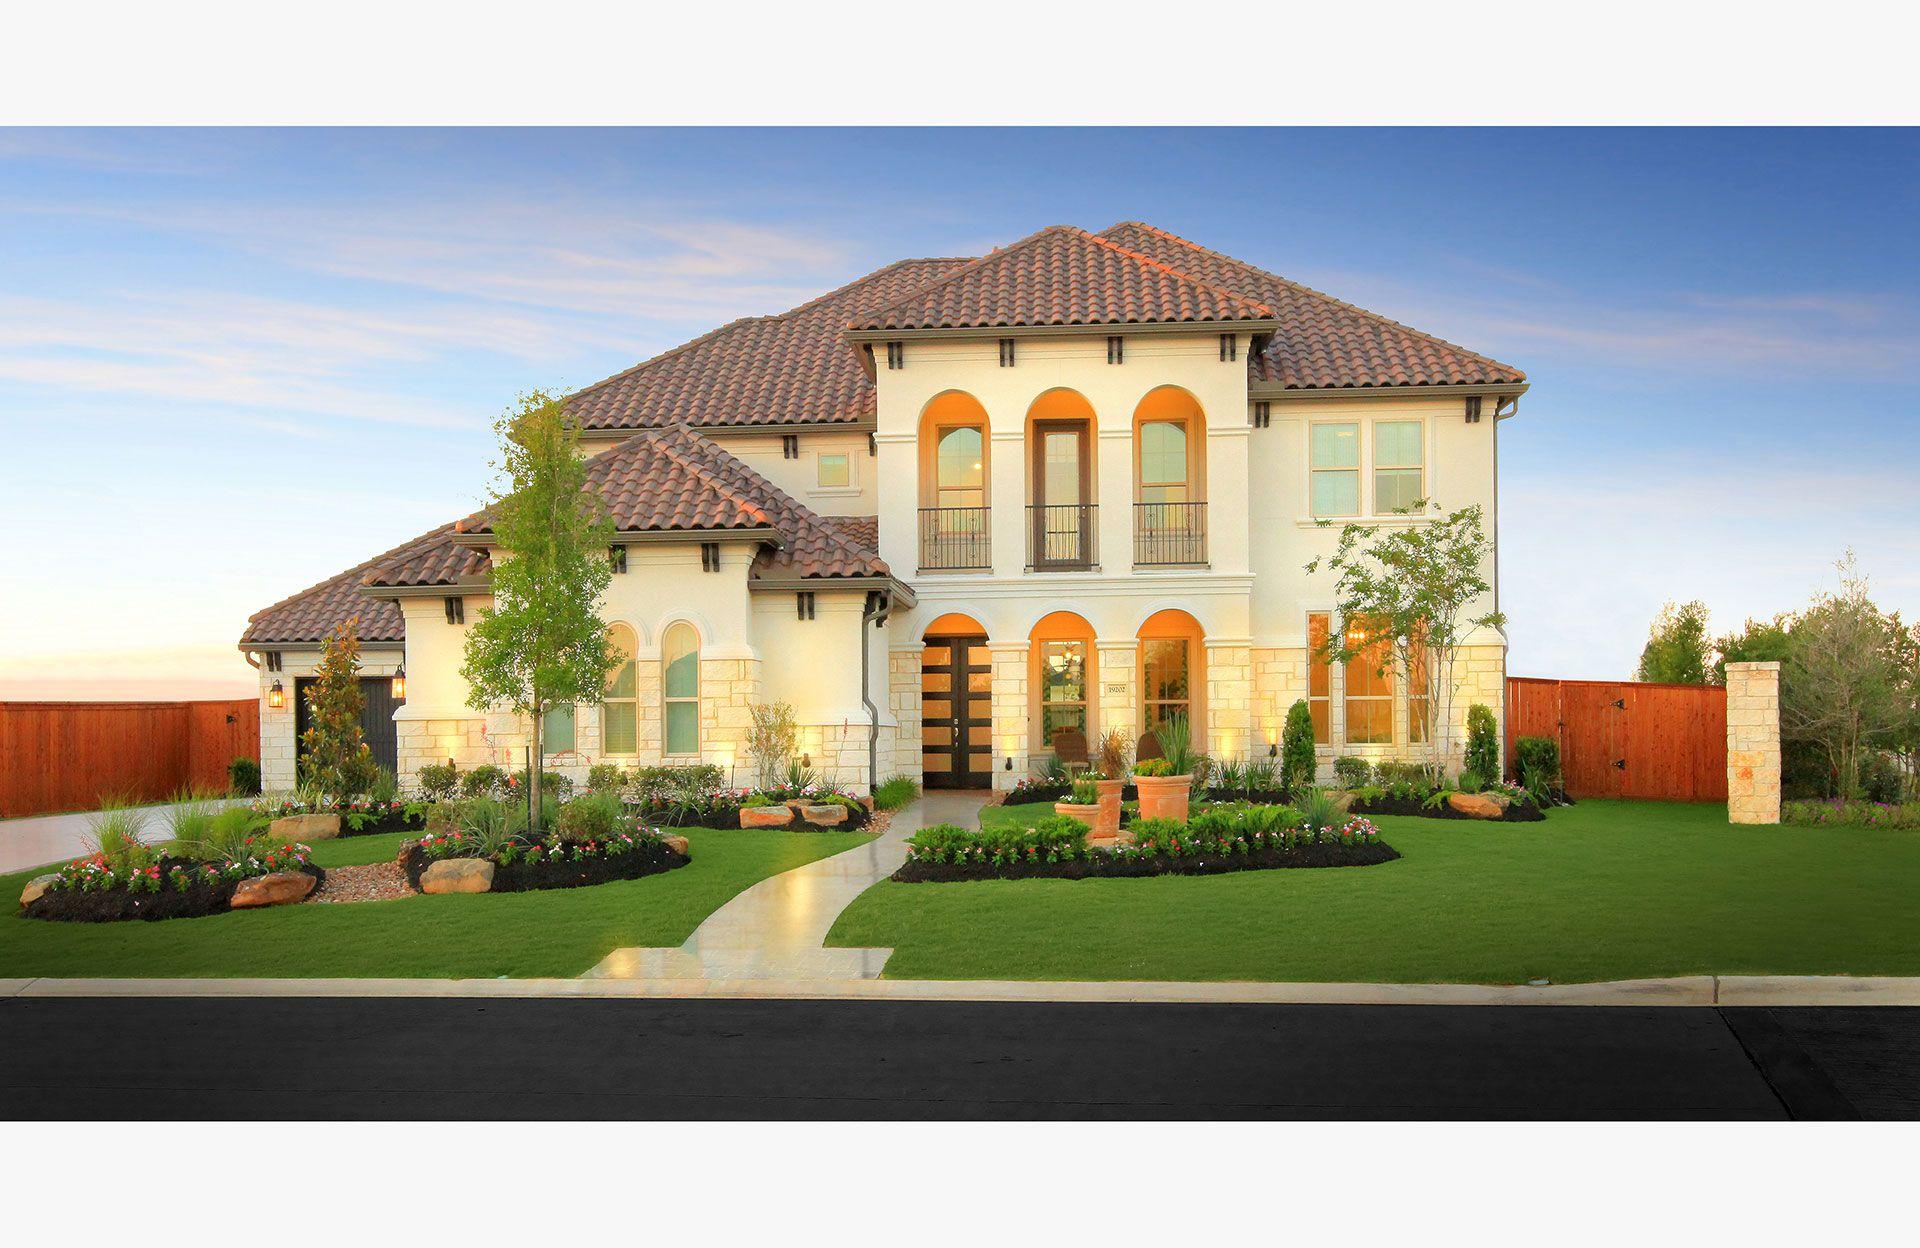 19202 West Austin Bayou Court, Cypress, TX Homes & Land - Real Estate